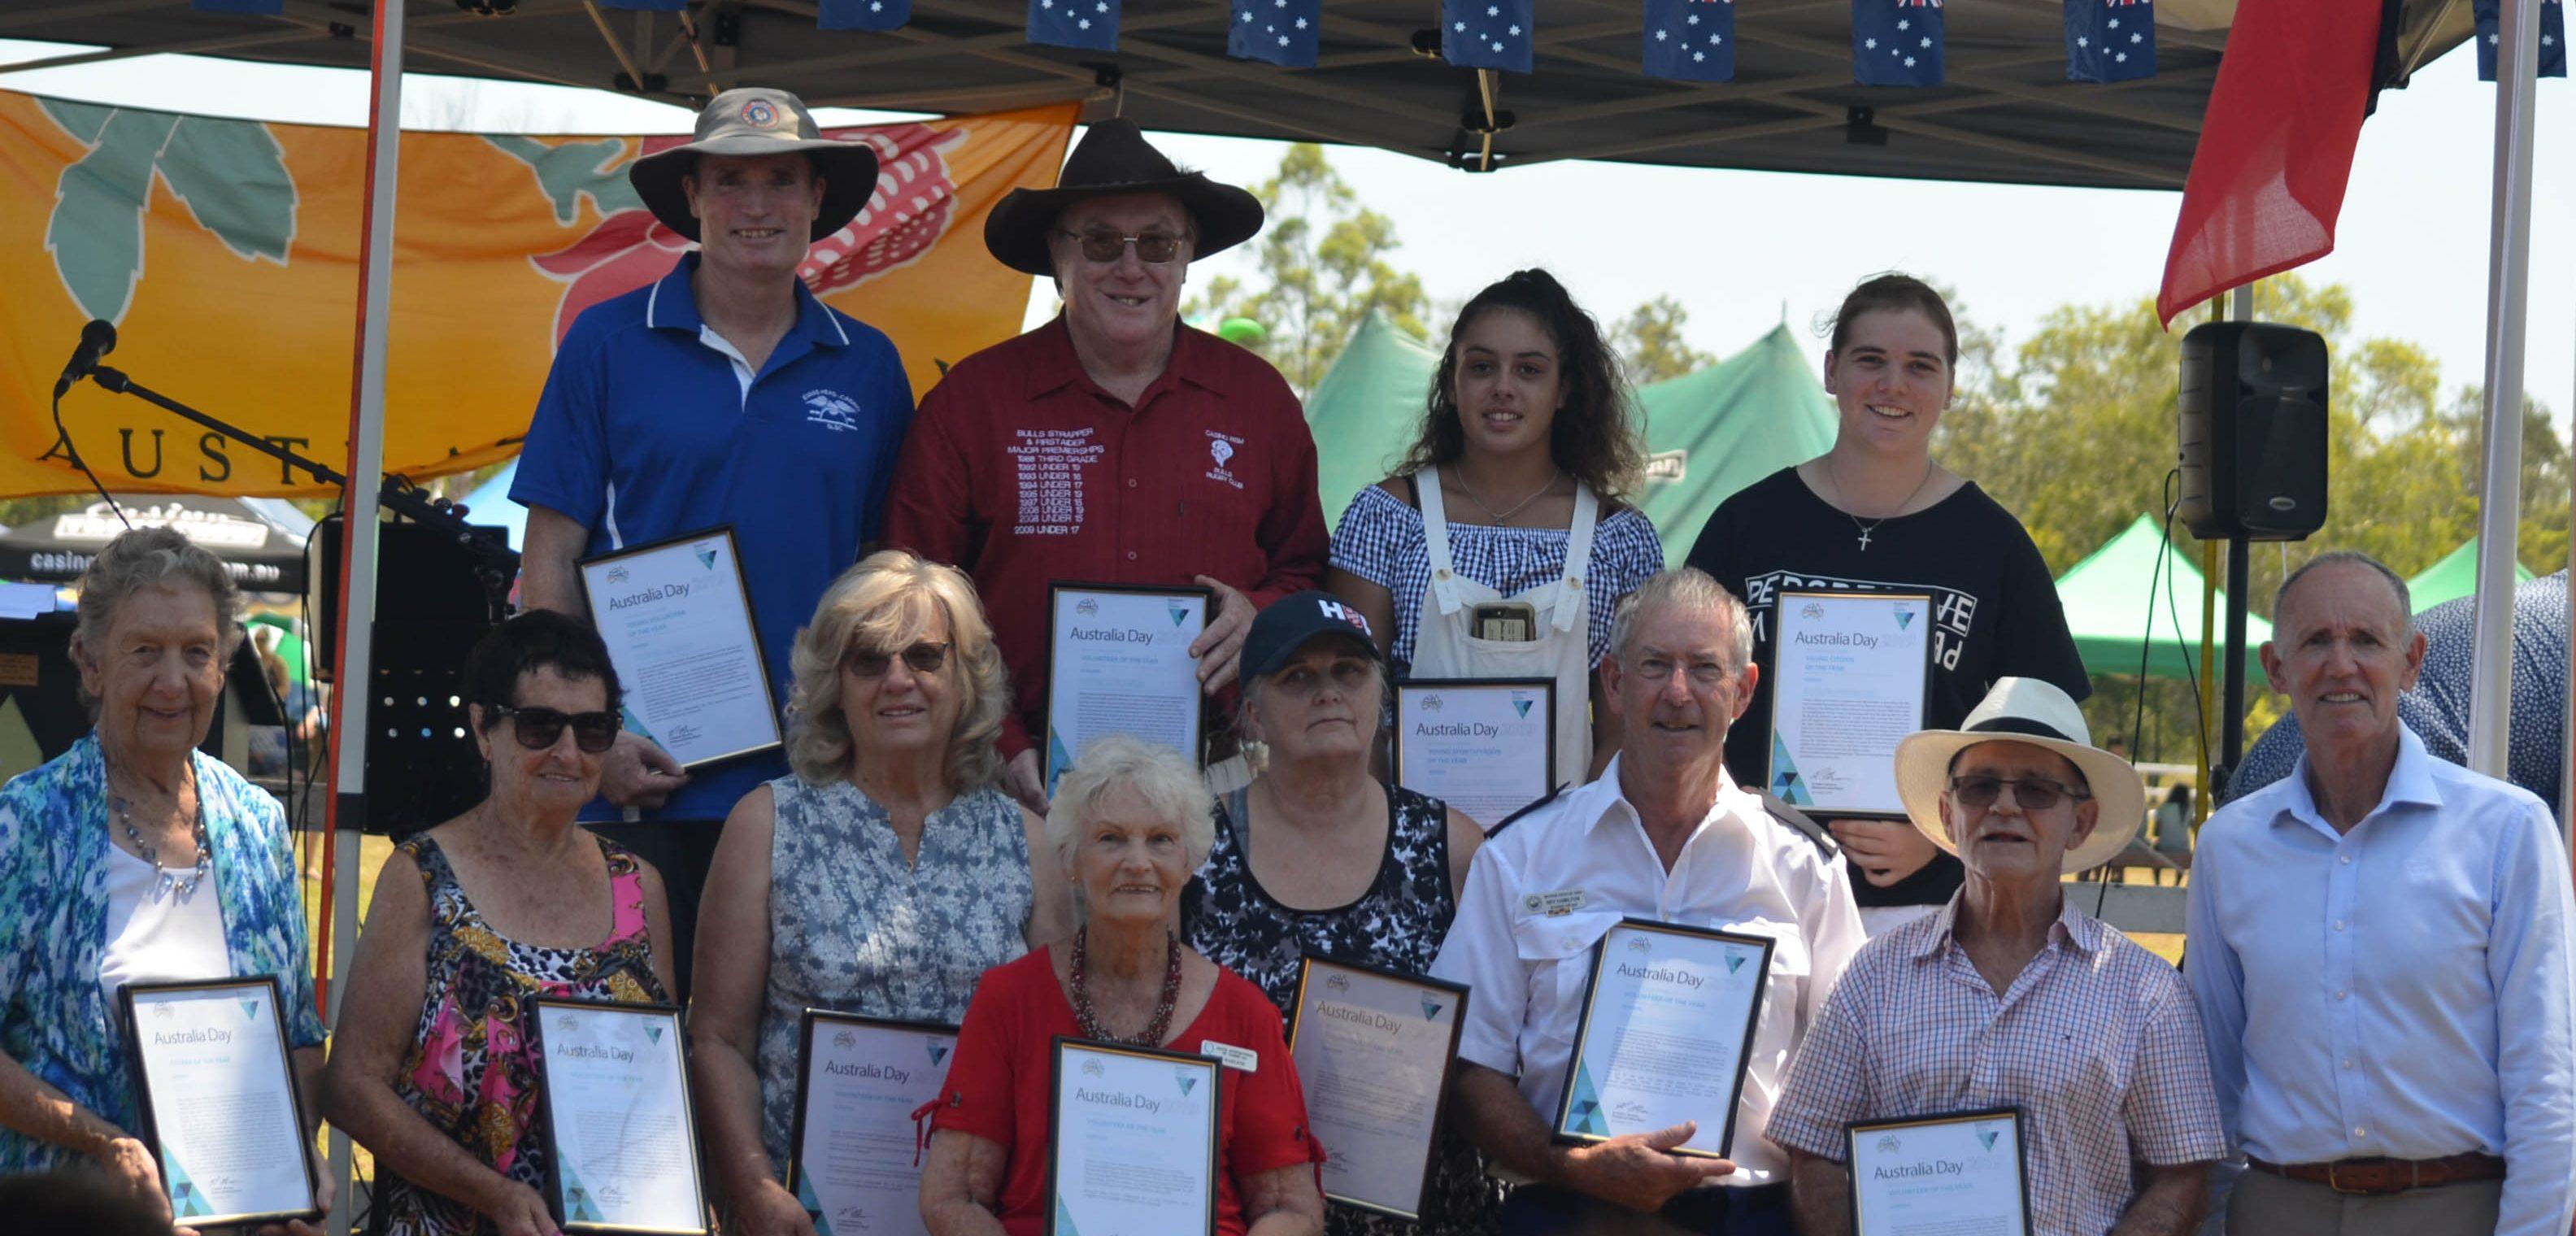 Richmond Valley Australia Day Celebrations